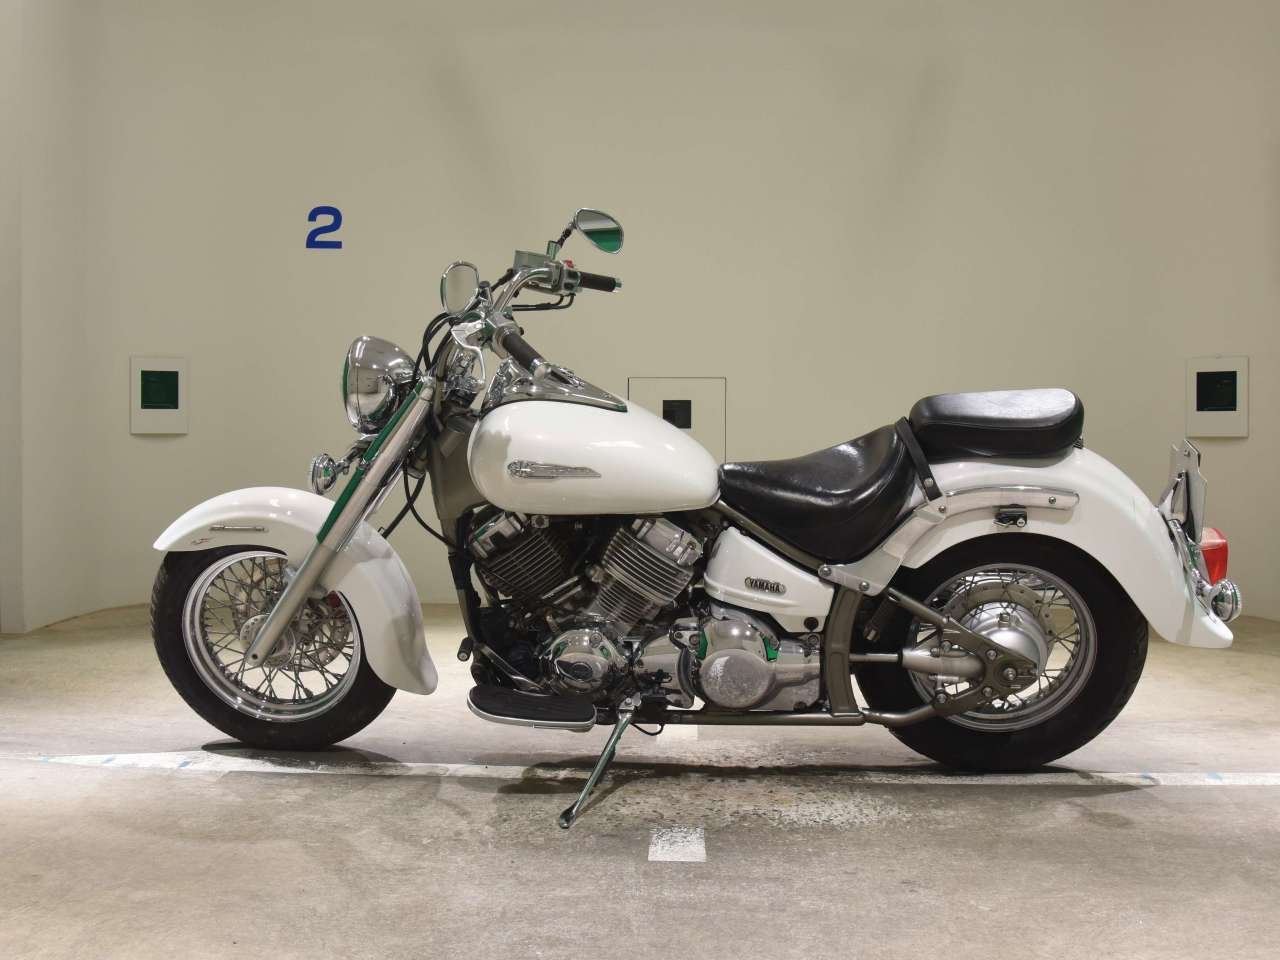 МОТОЦИКЛ YAMAHA DRAG STAR 400 Classic 2009  Артмото - купить квадроцикл в украине и харькове, мотоцикл, снегоход, скутер, мопед, электромобиль